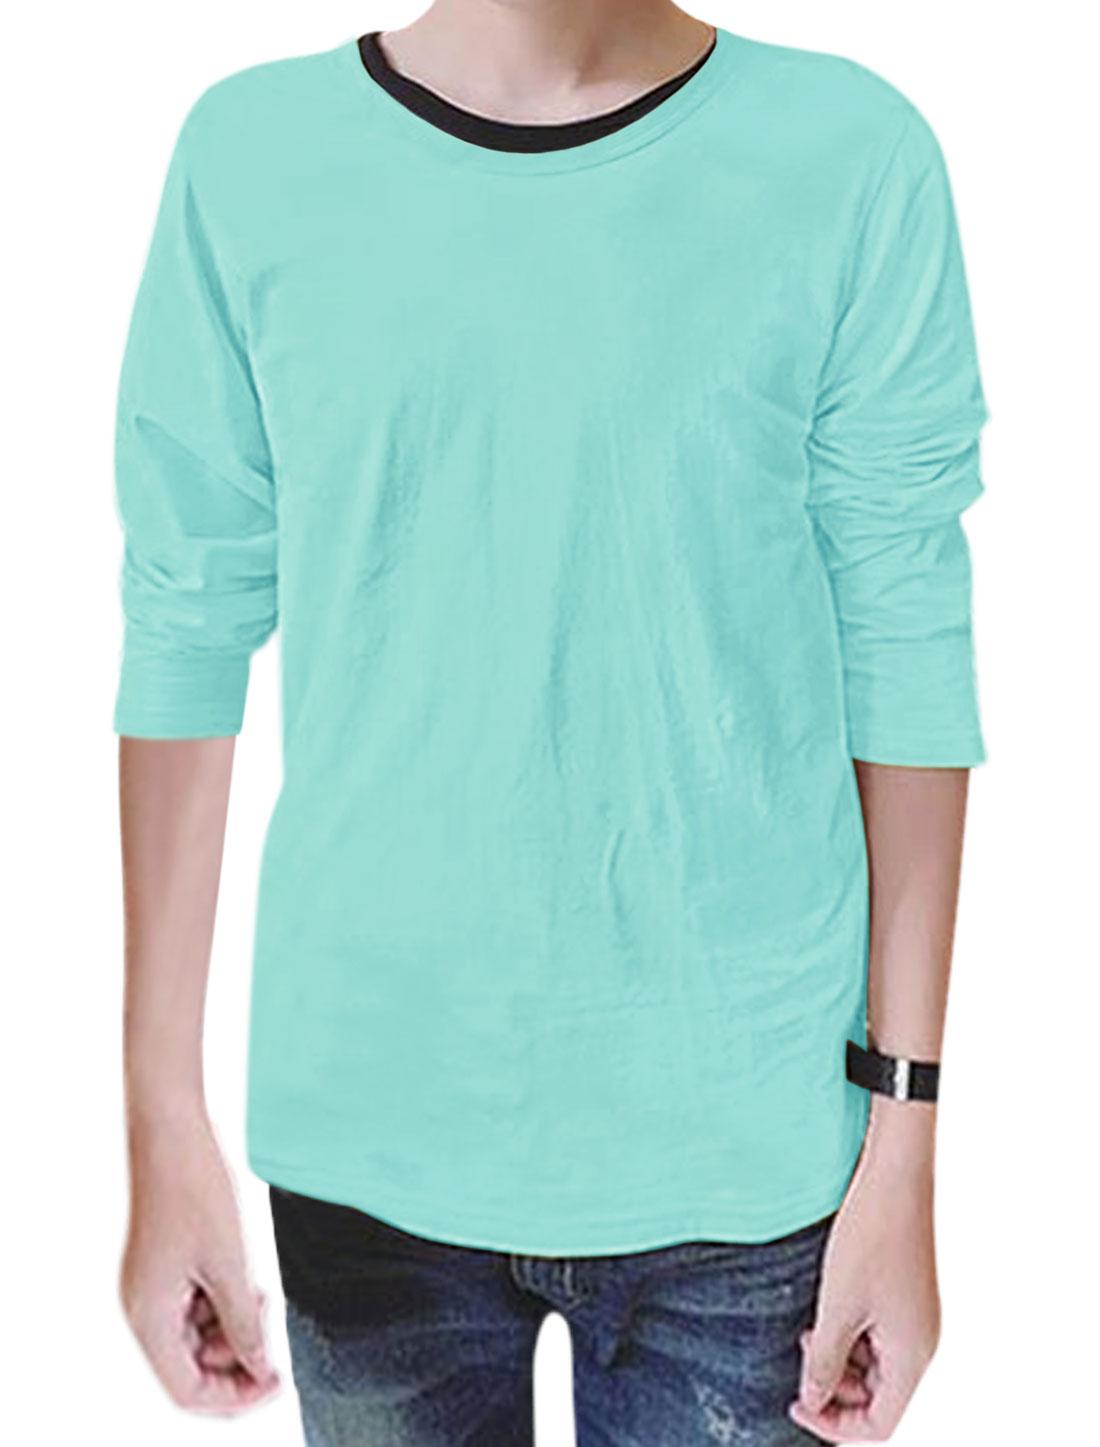 Man Round Neck Long Sleeves Slim Fit T-Shirt Light Blue M